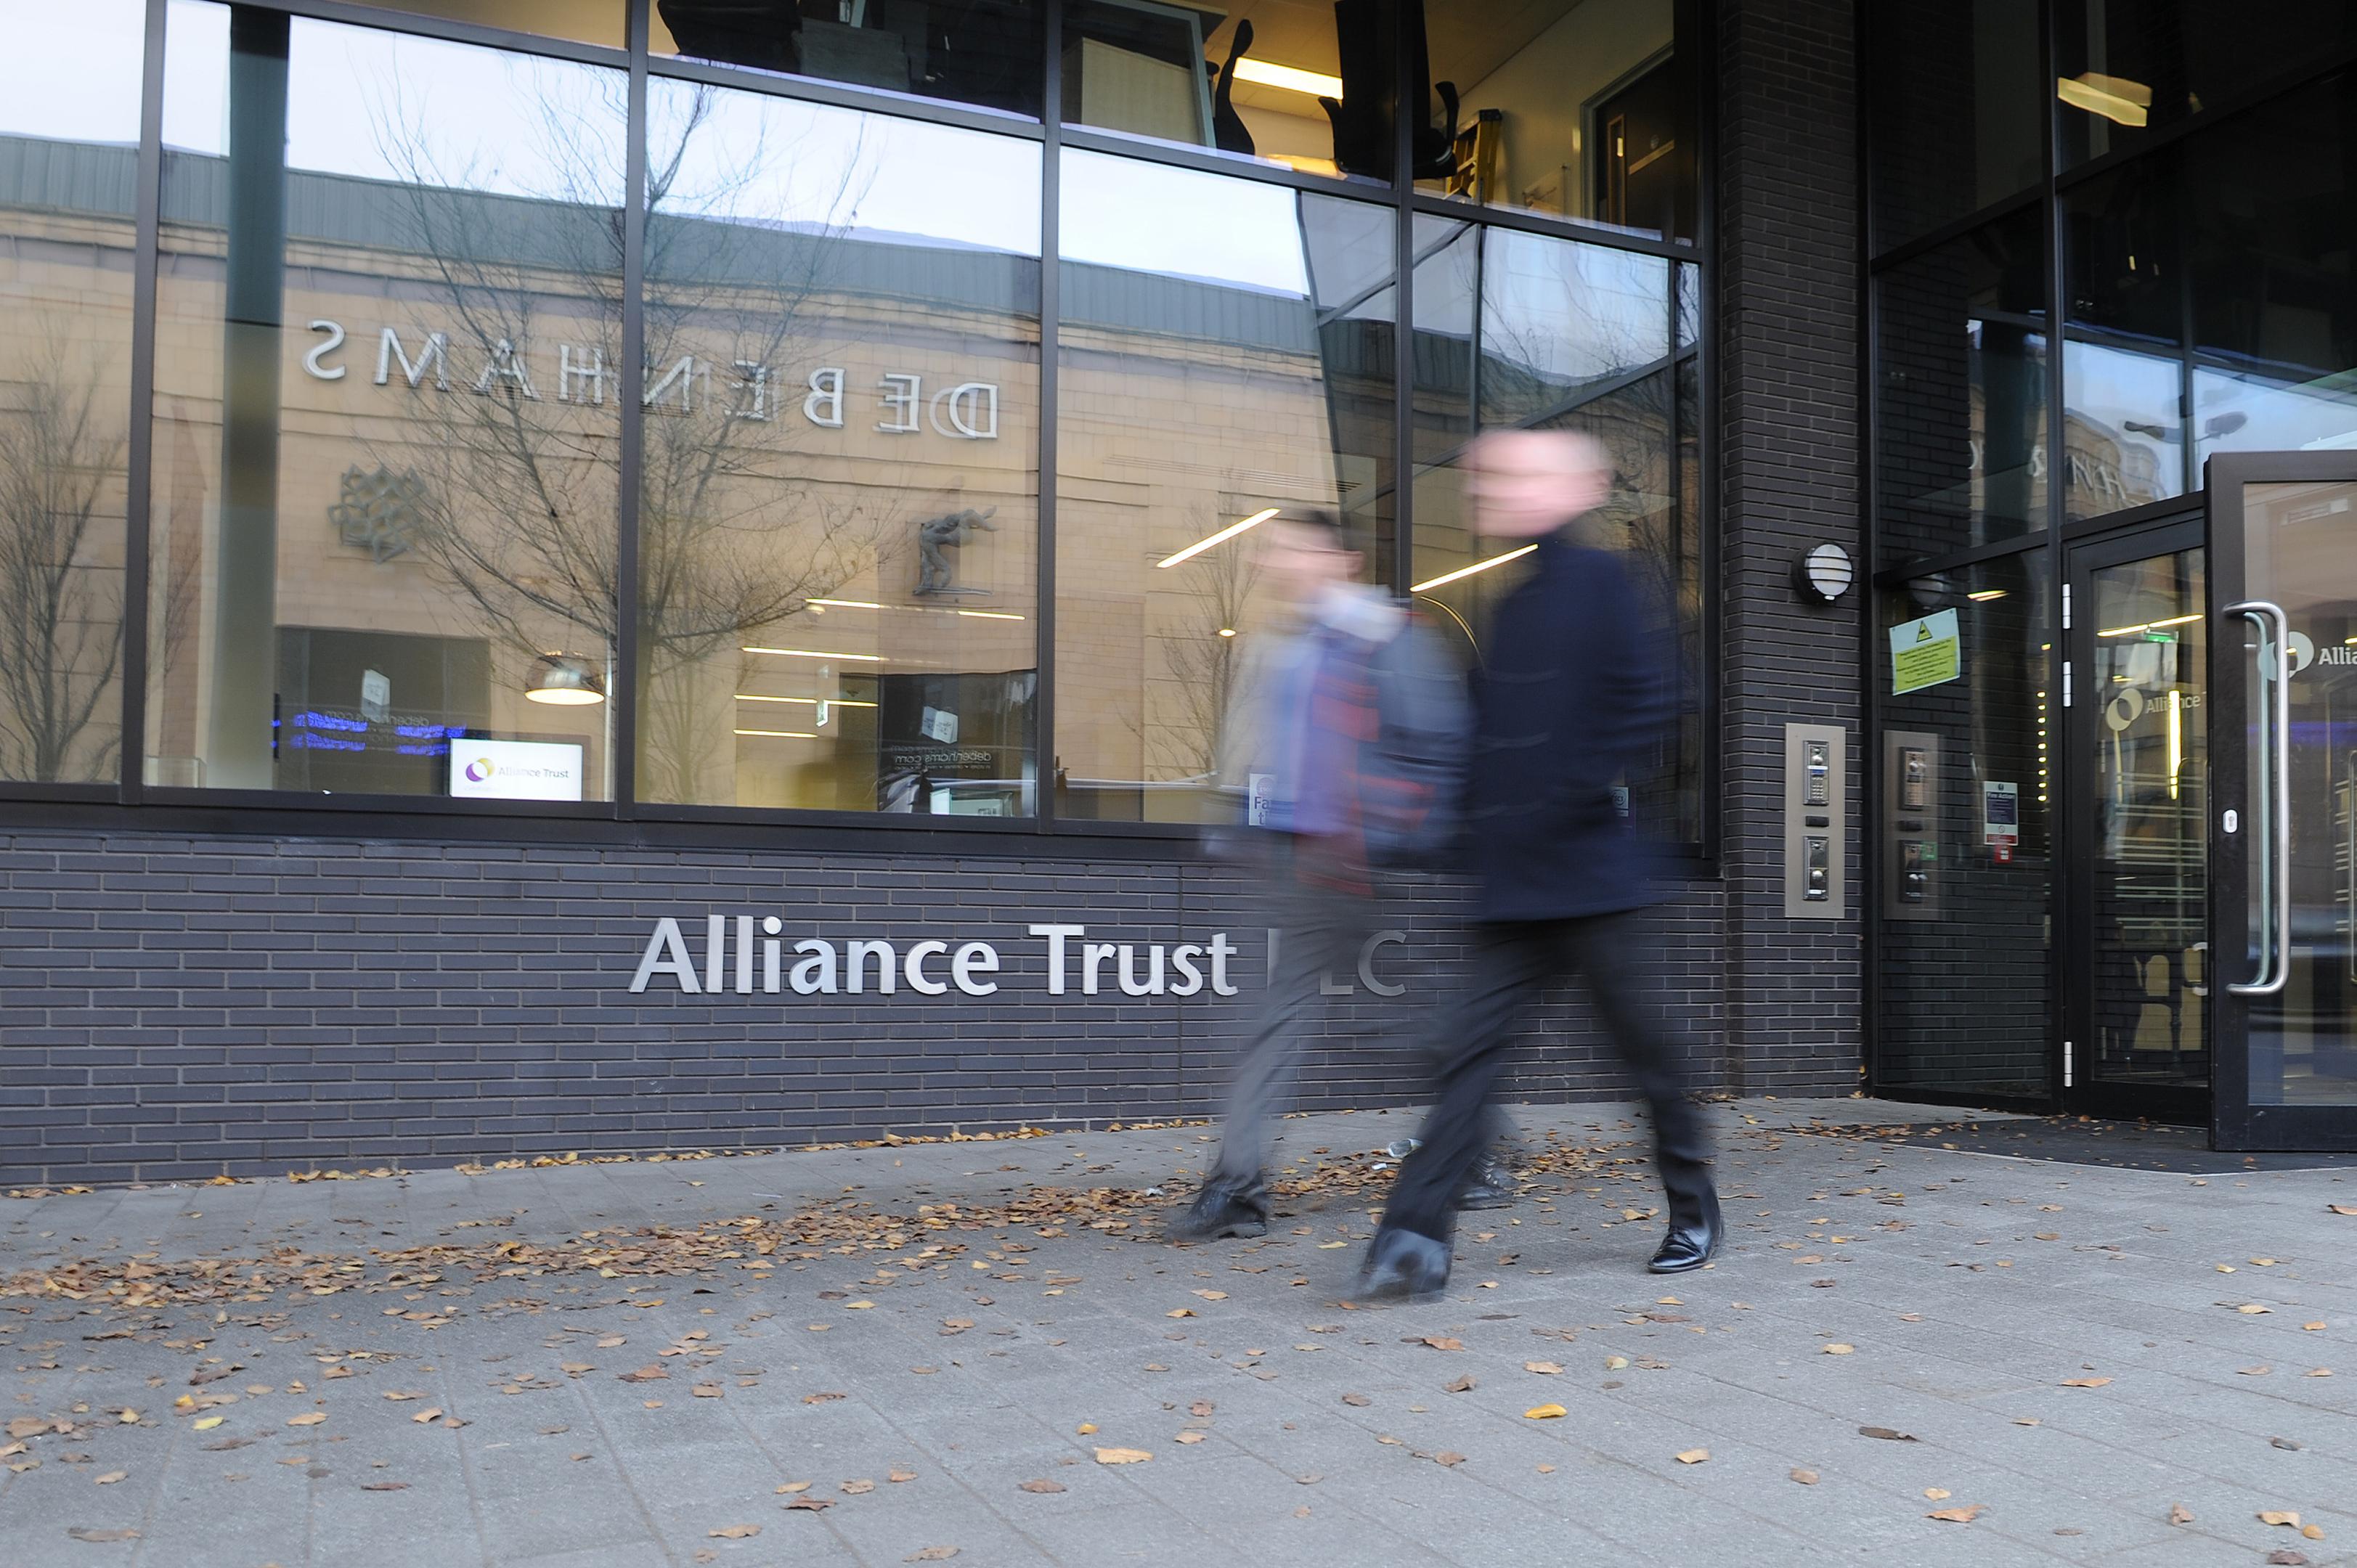 Alliance Trust's headquarters on West Marketgait. Dundee